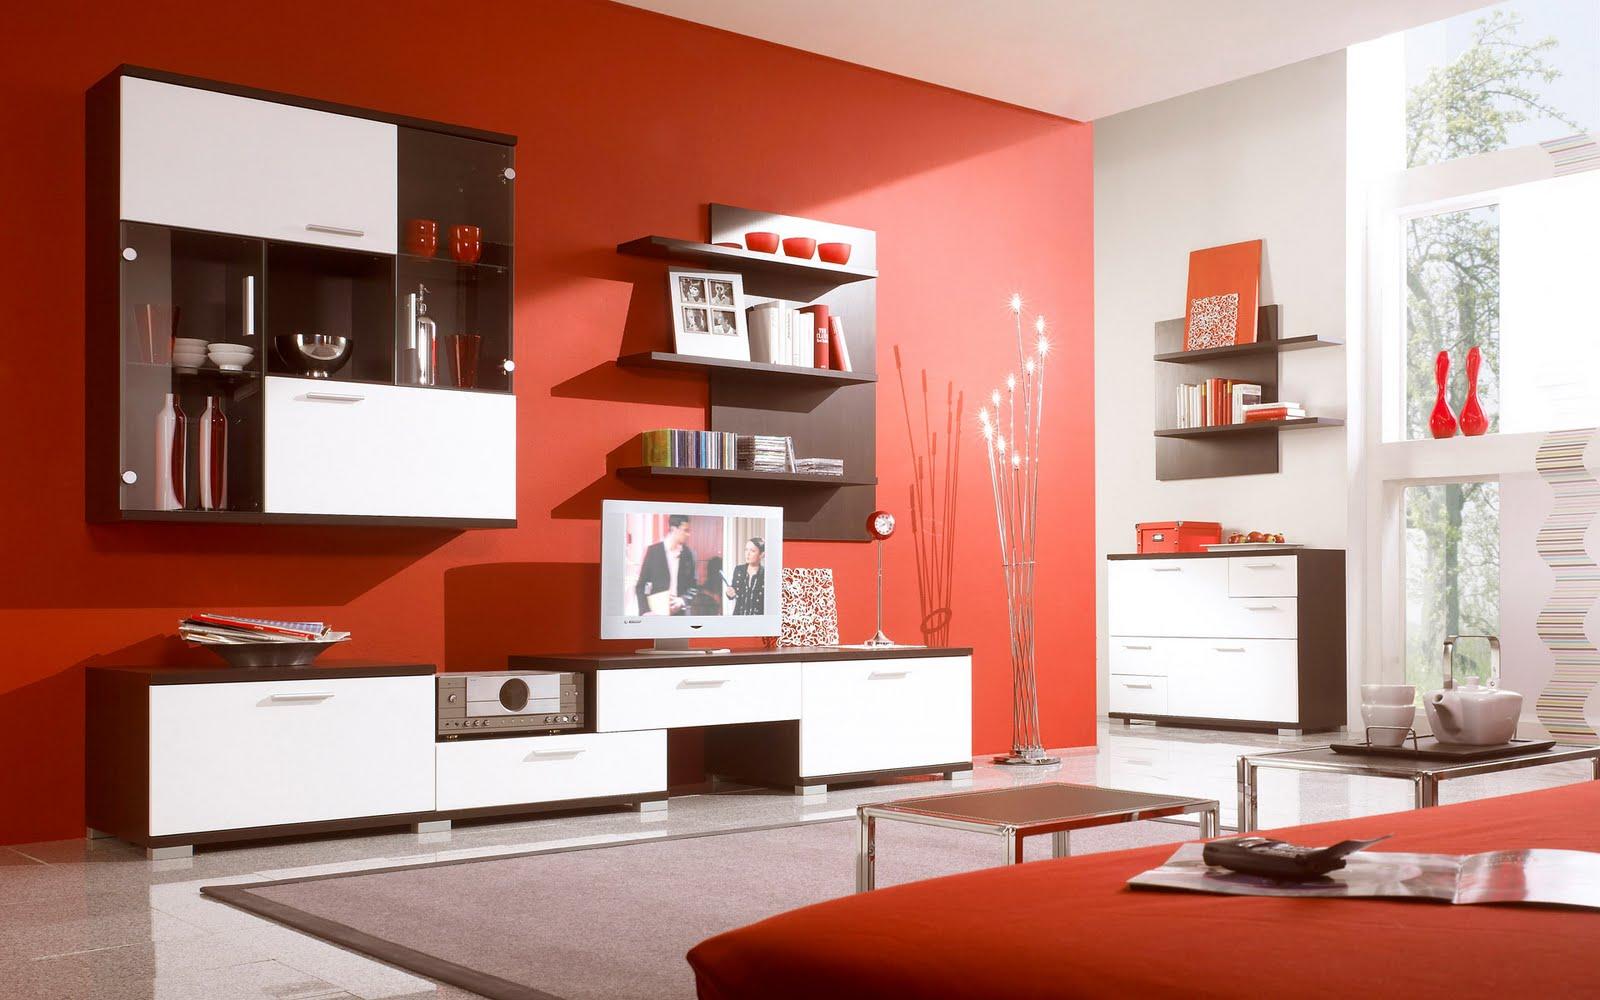 Elements Of Interior Room Design. Elements Of Interior Room Design   Top Home Design Manifuest